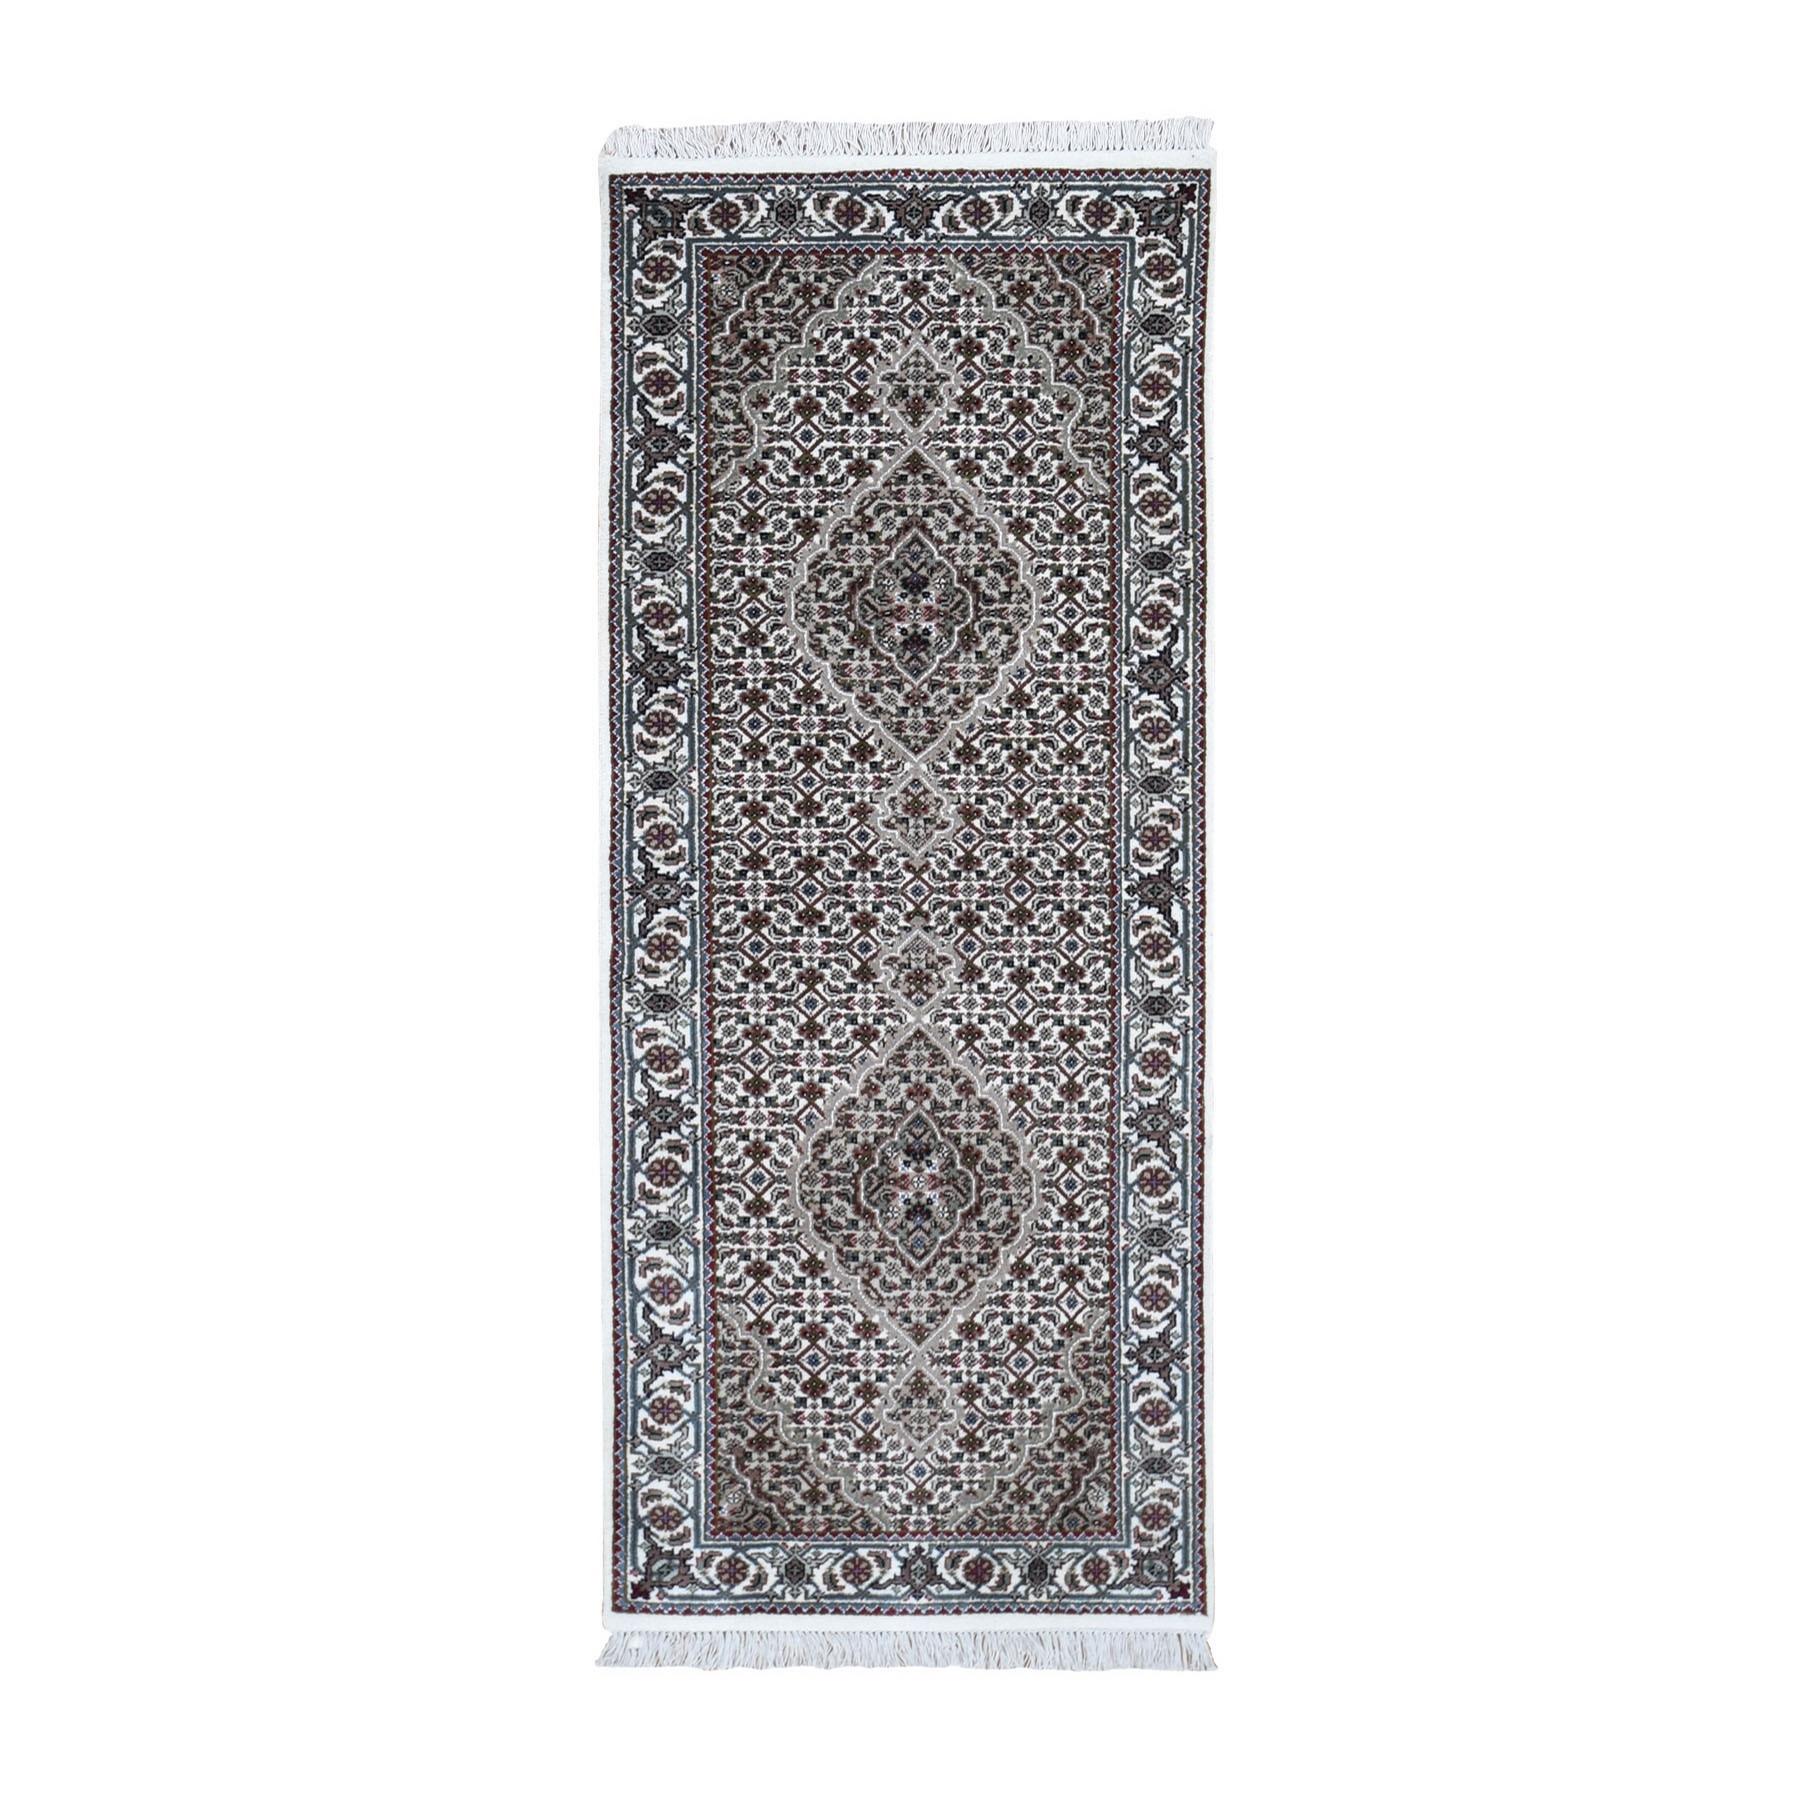 "2'7""x6'7"" Ivory Runner Wool And Silk Tabriz Mahi Design Hand Knotted Oriental Rug 49554"